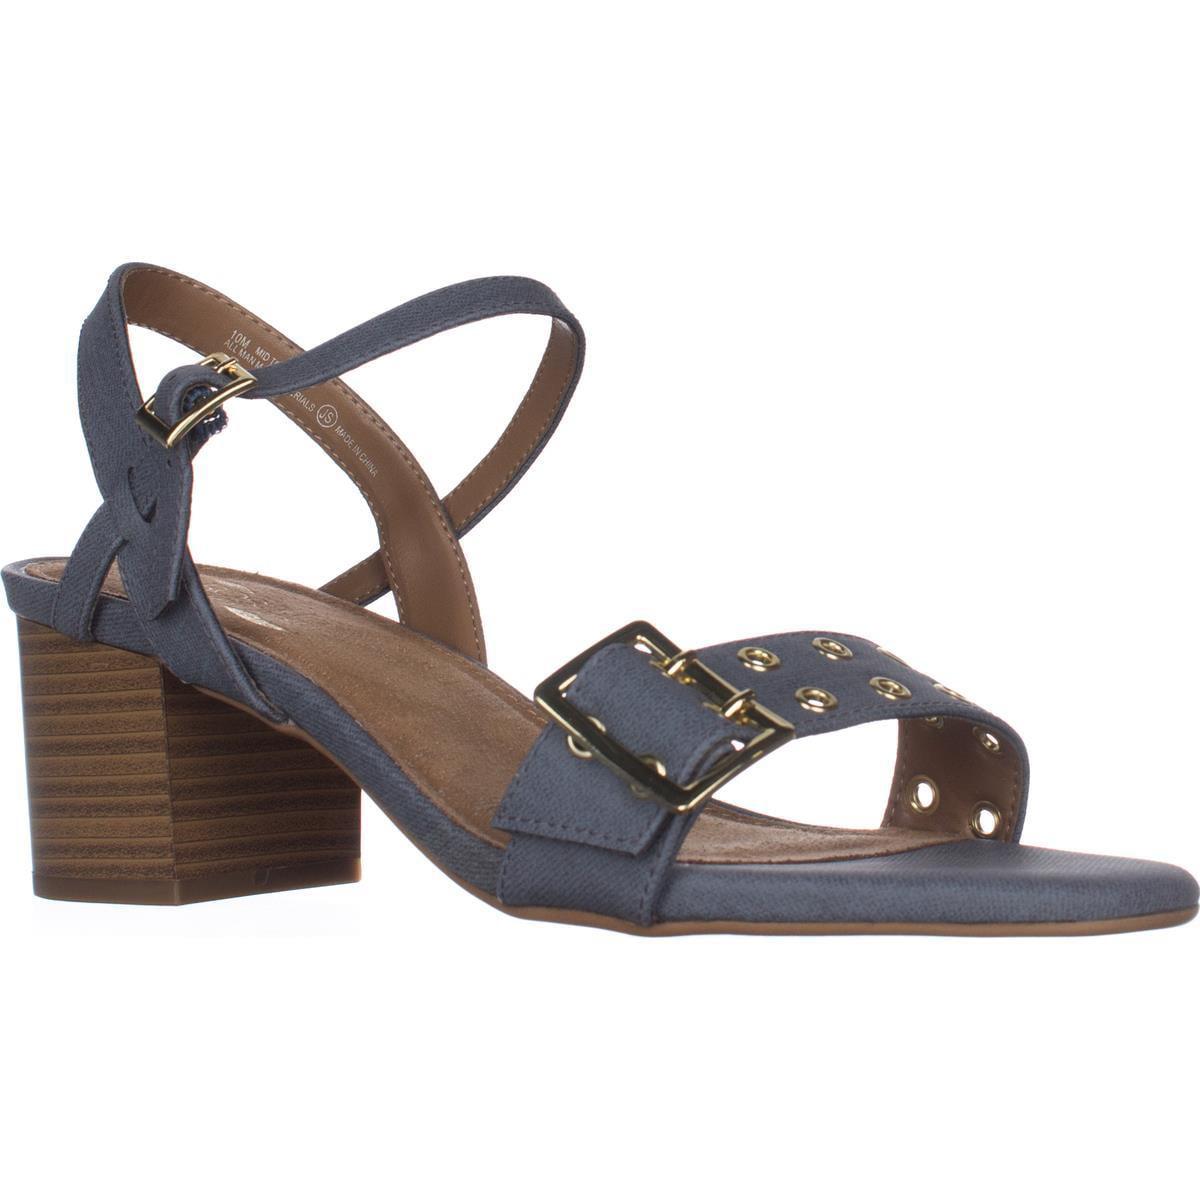 Womens Aerosoles Mid Town Dress Sandals, Blue by Aerosoles